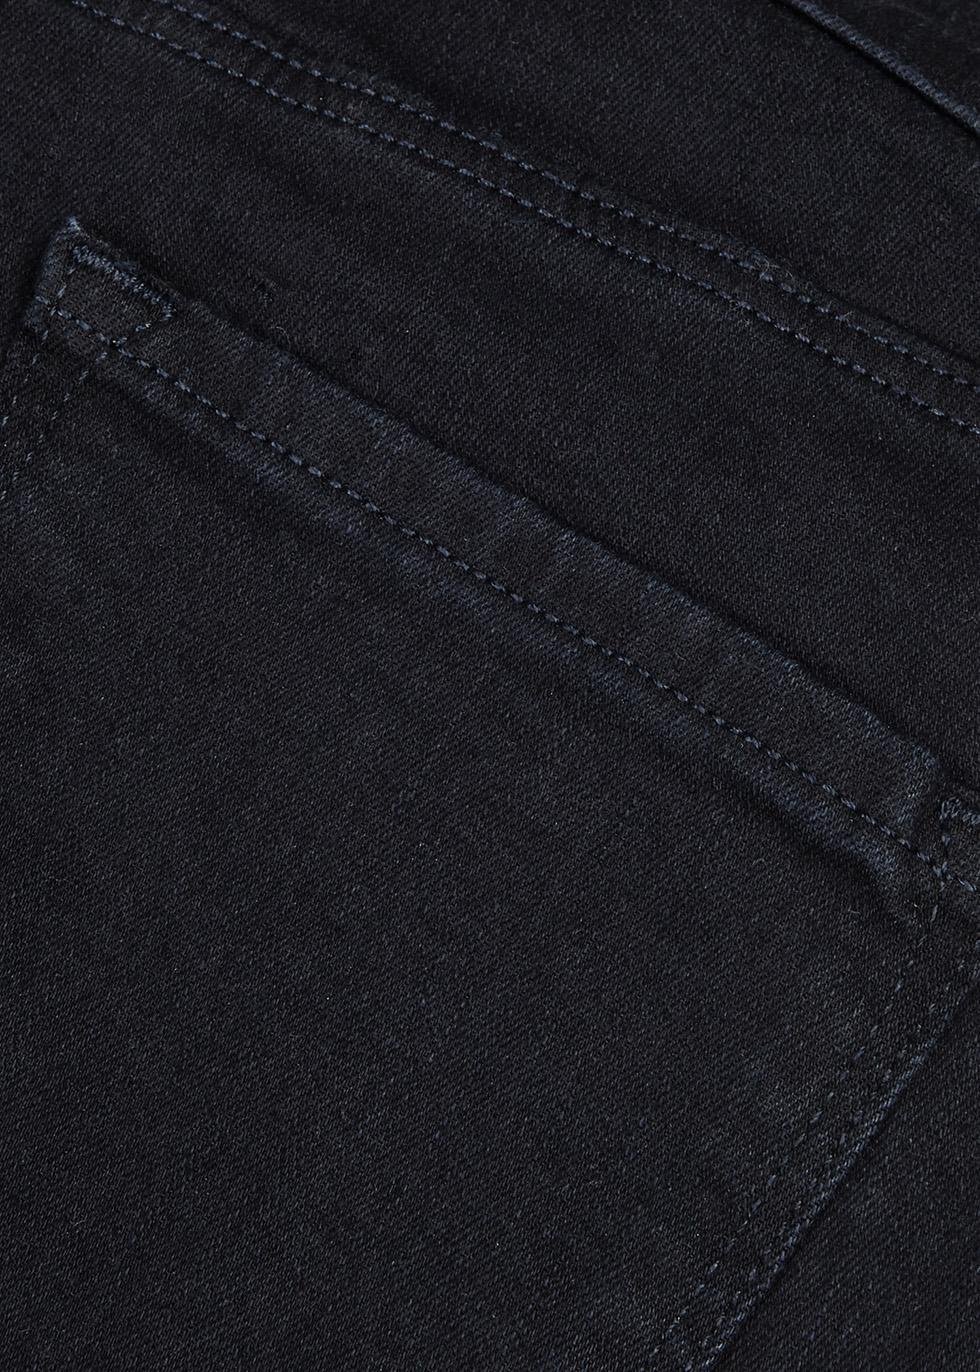 Alana indigo cropped skinny jeans - J Brand